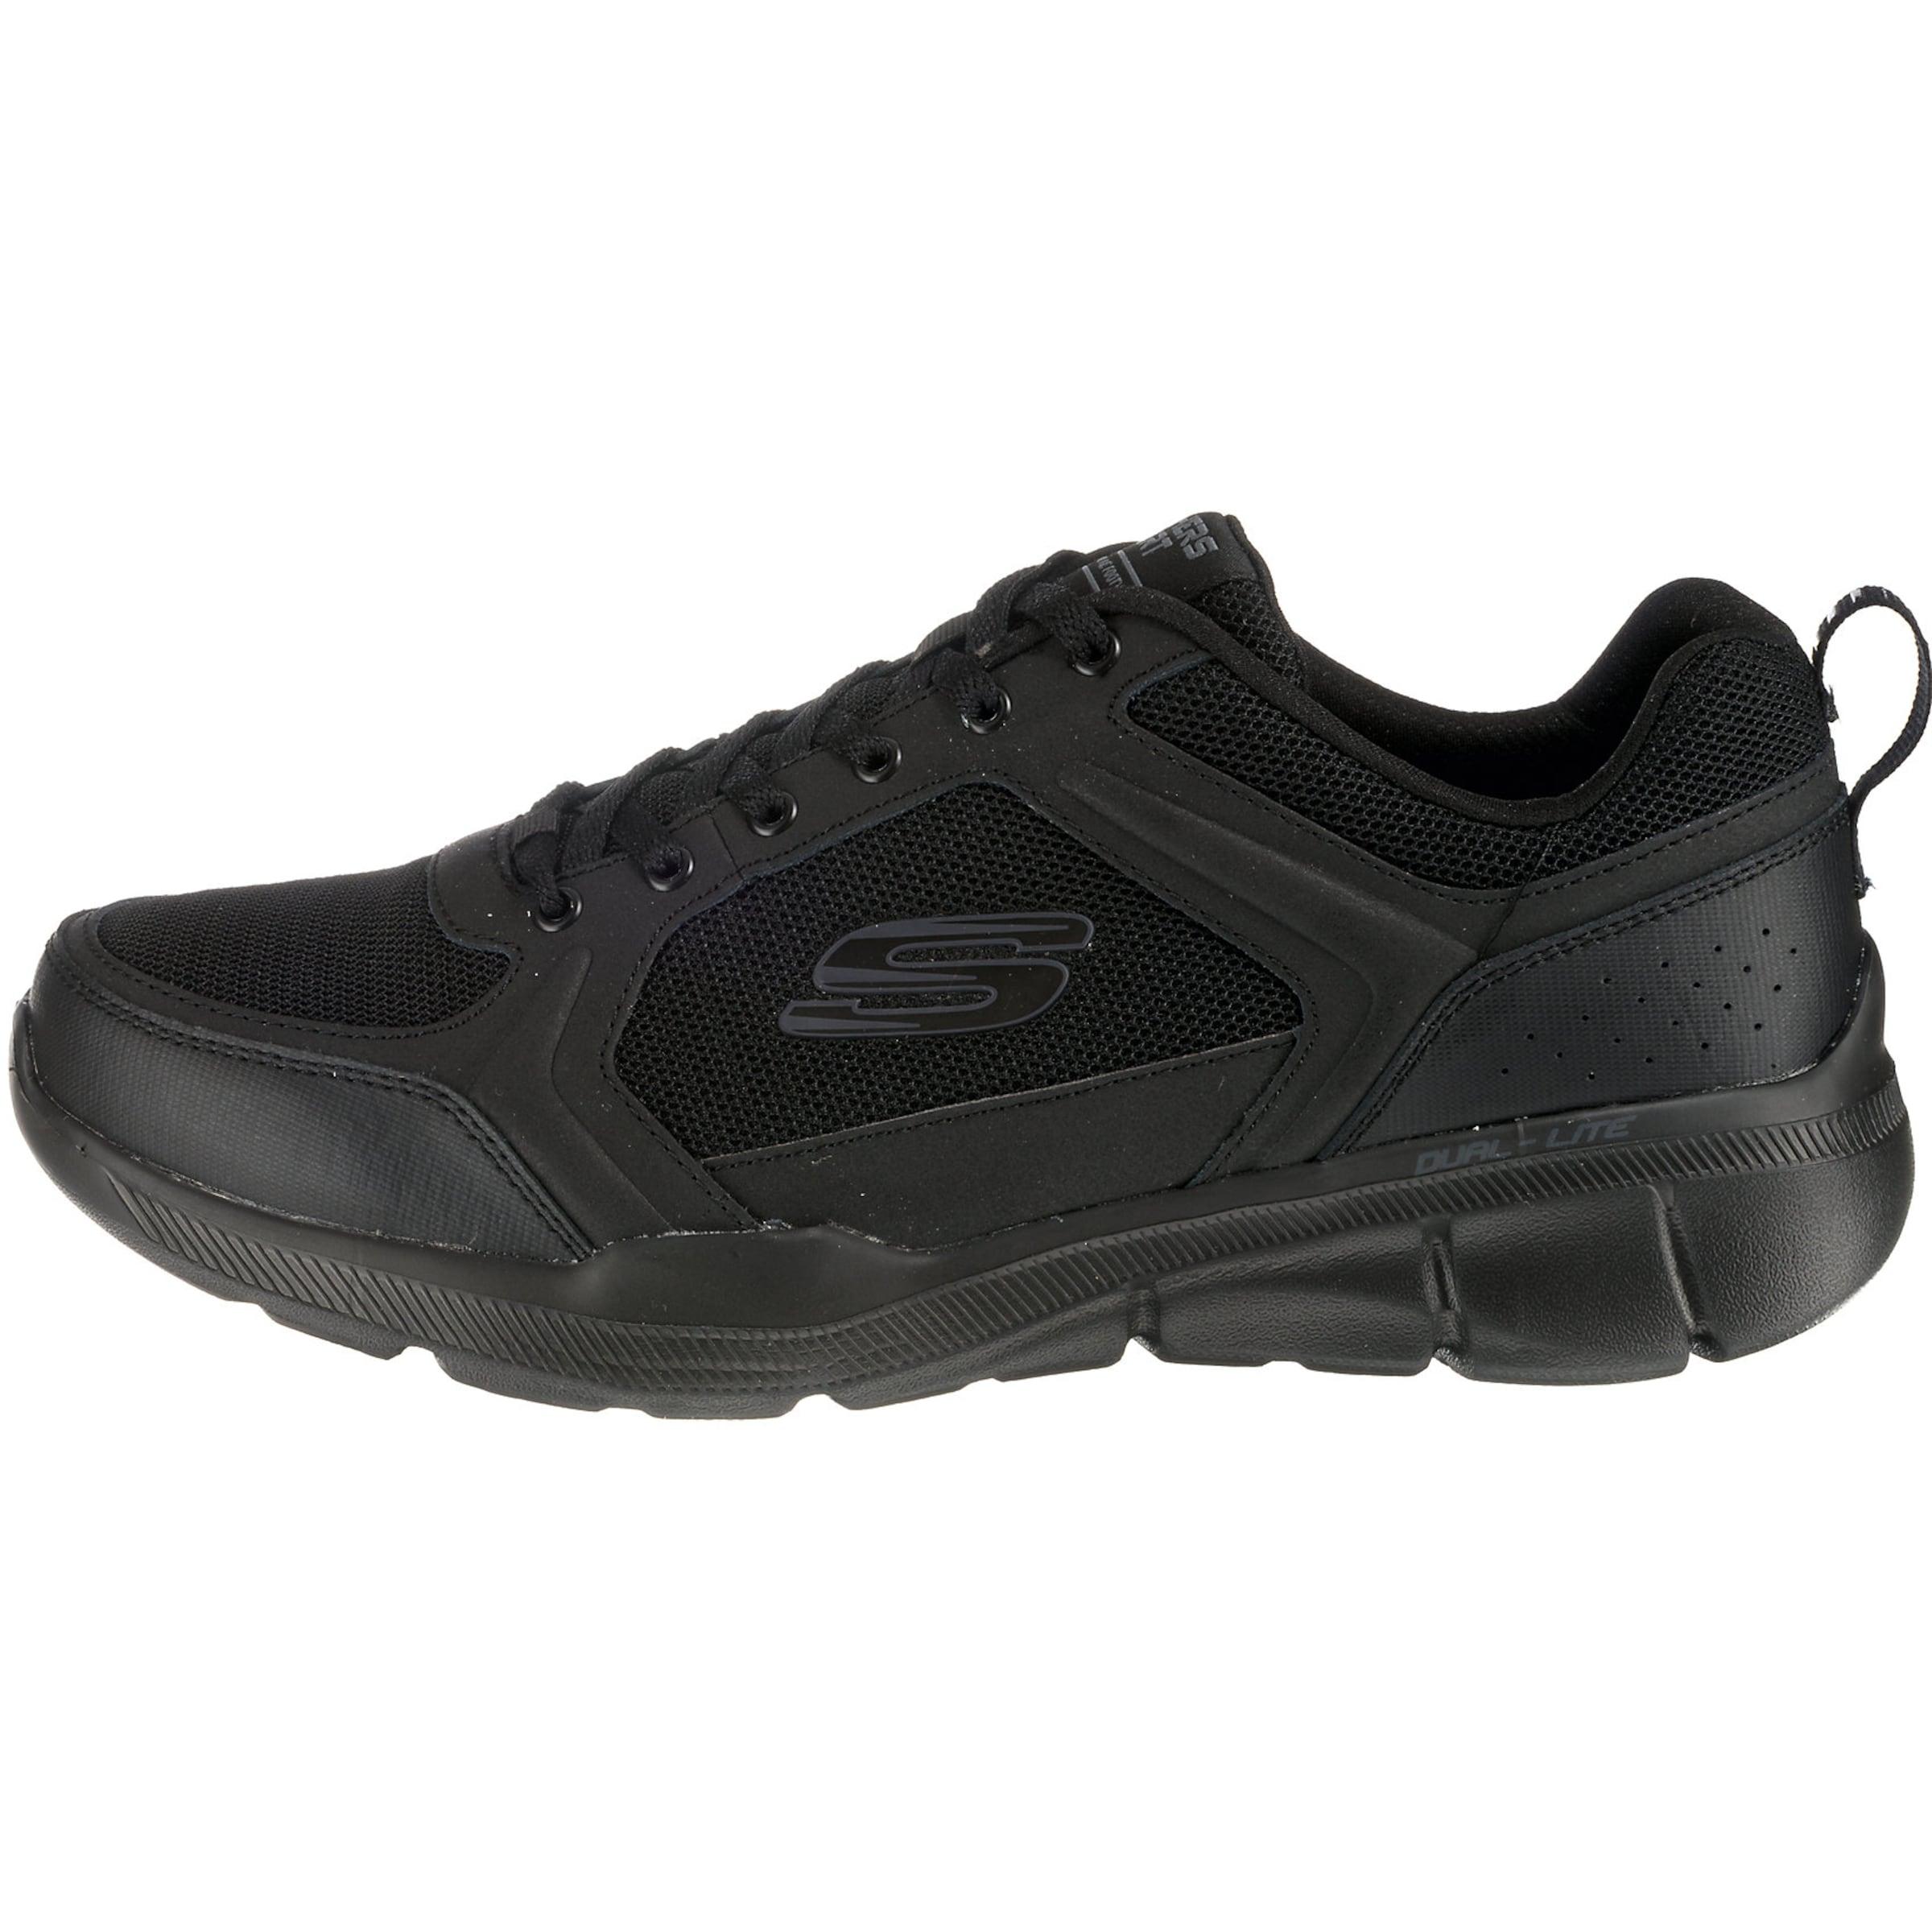 3 Schwarz 0 Skechers In Sneaker Deciment' 'equalizer N8wvmn0O